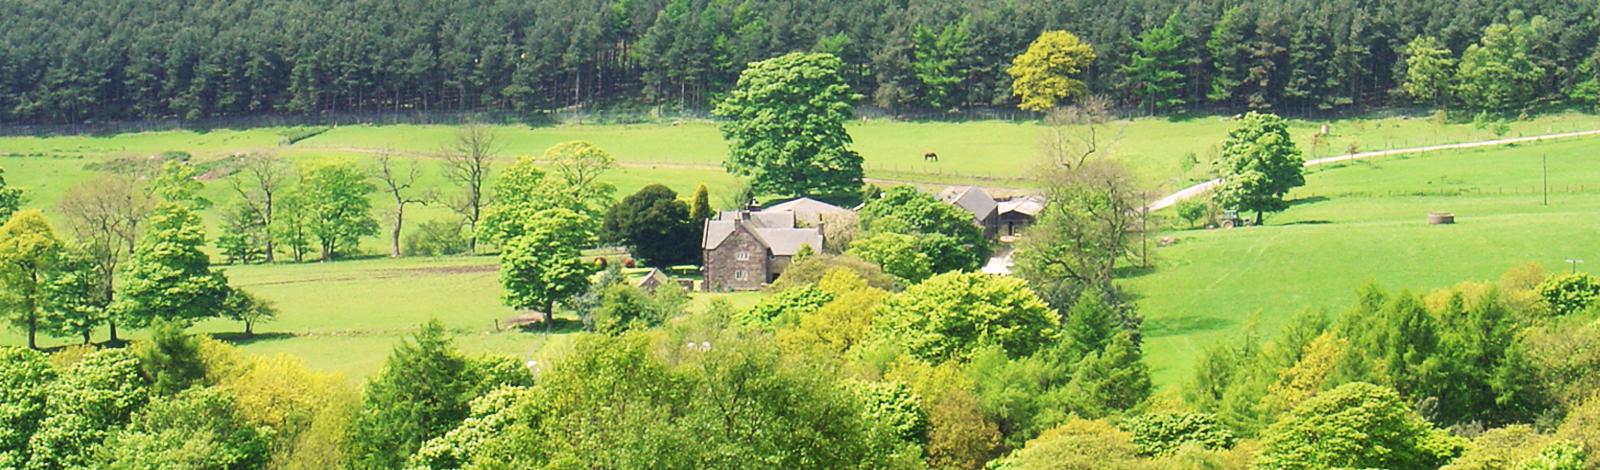 fairboroughs-aerial-view